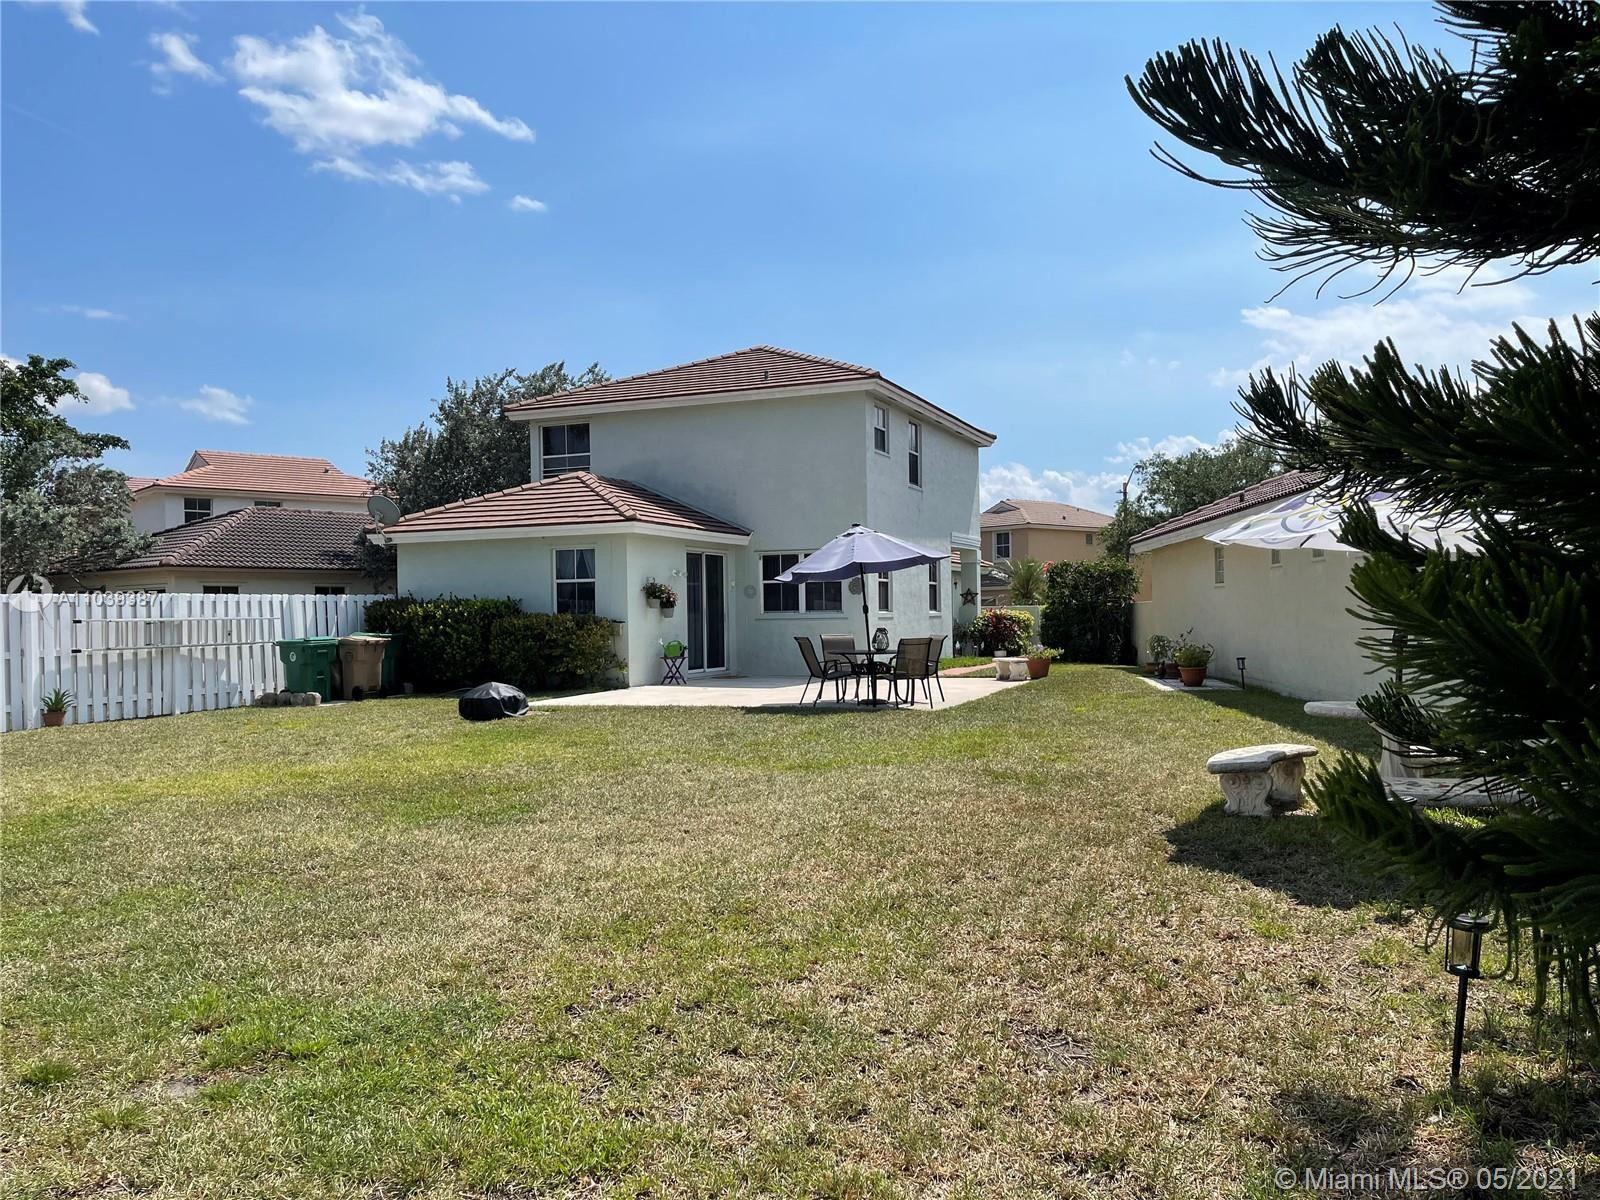 Photo of 6948 SW 148th Ln, Davie, FL 33331 (MLS # A11039387)